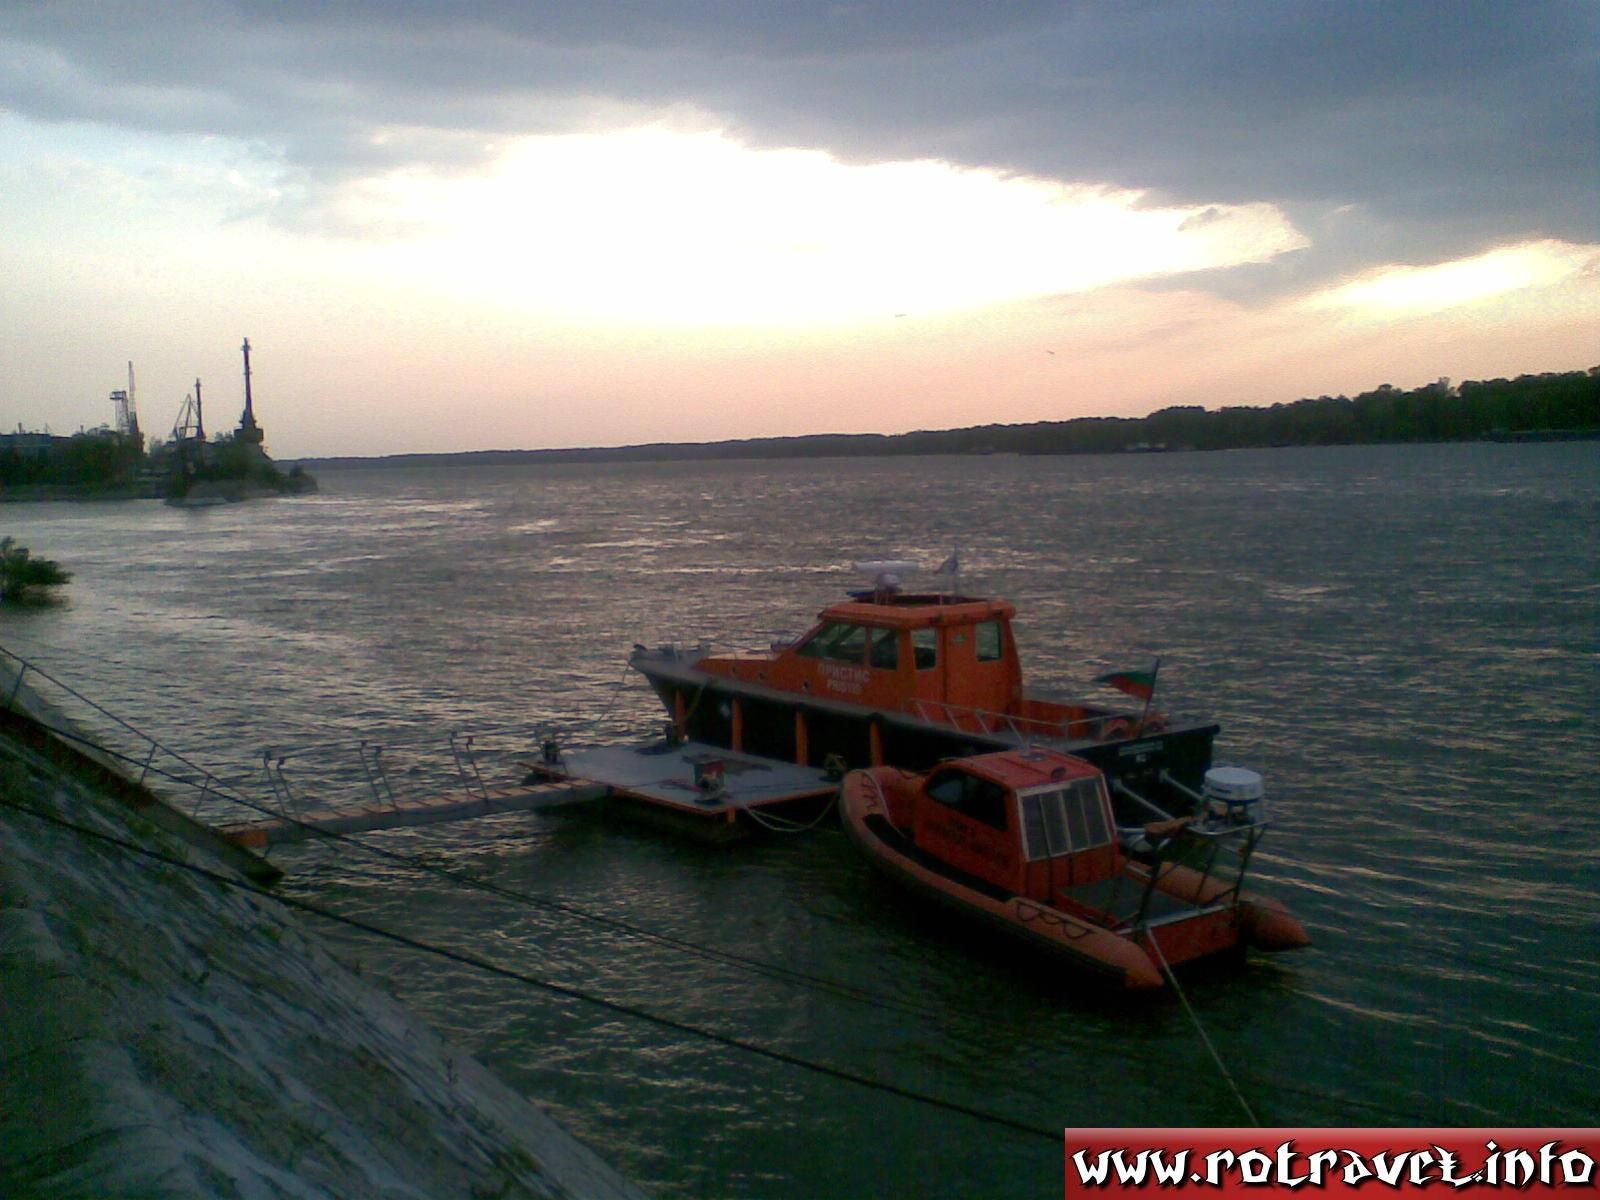 A motorboat on Danube